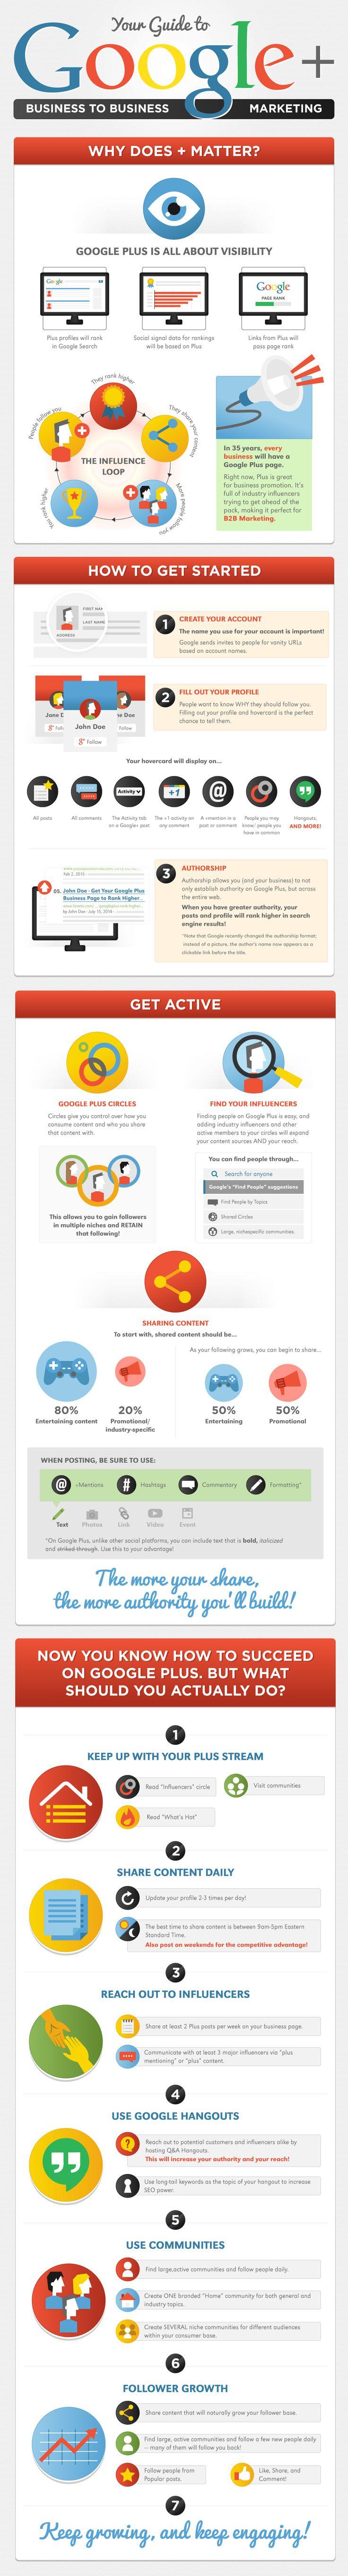 Your Guide to #GooglePlus B2B Marketing [INFOGRAPHIC] #google+ #socialmedia